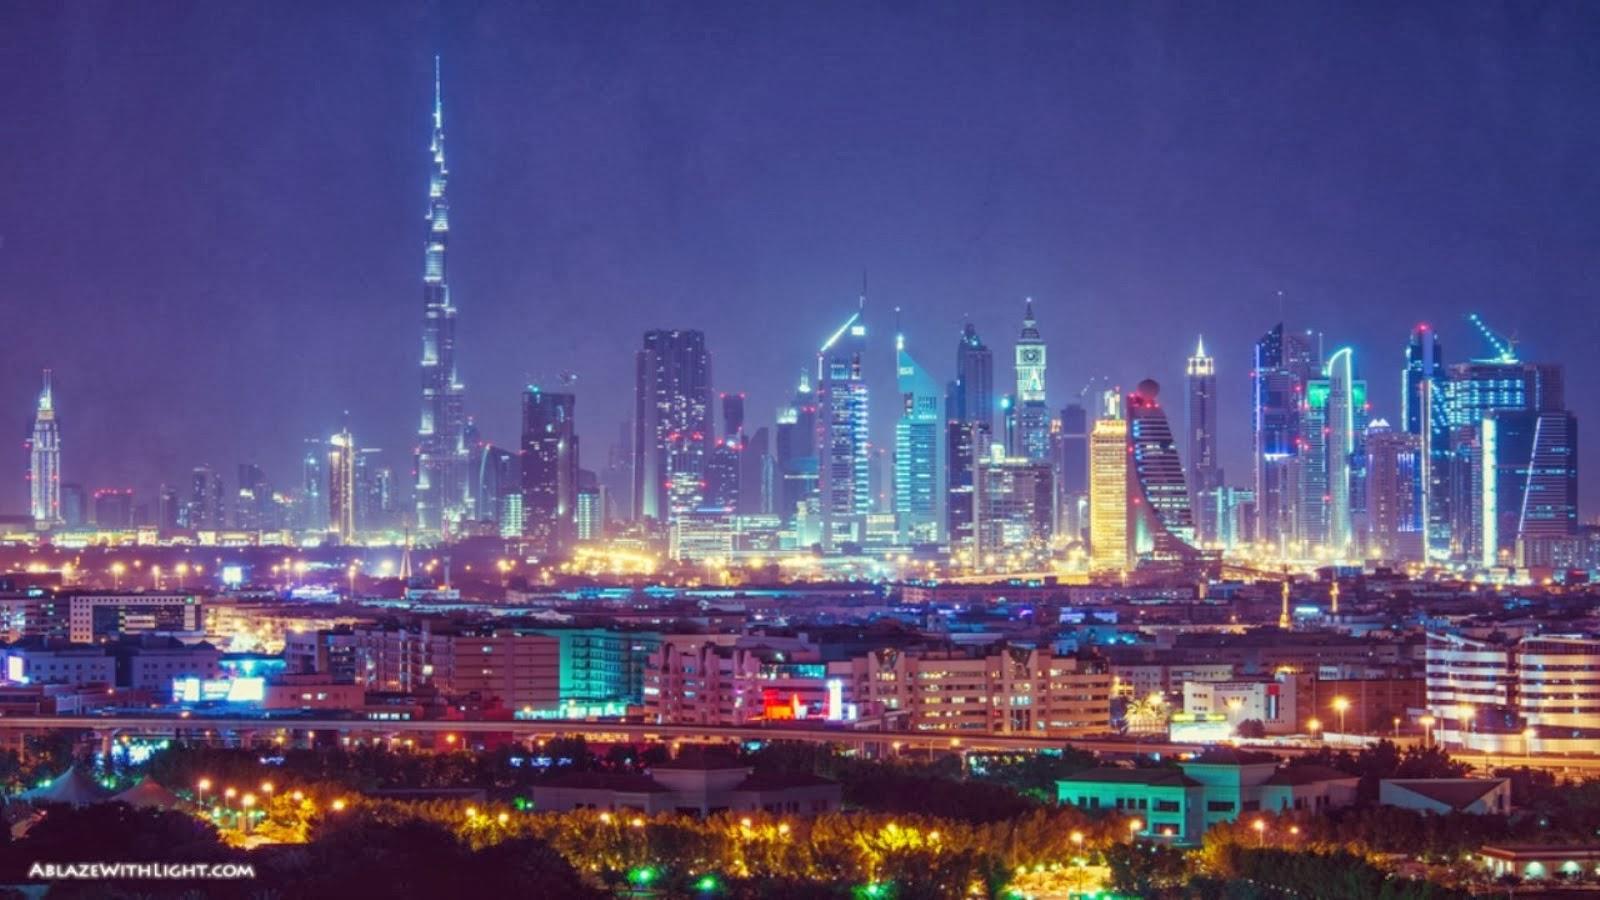 HD WALLPAPERS Download Dubai City HD Wallpapers 1080p 1600x900